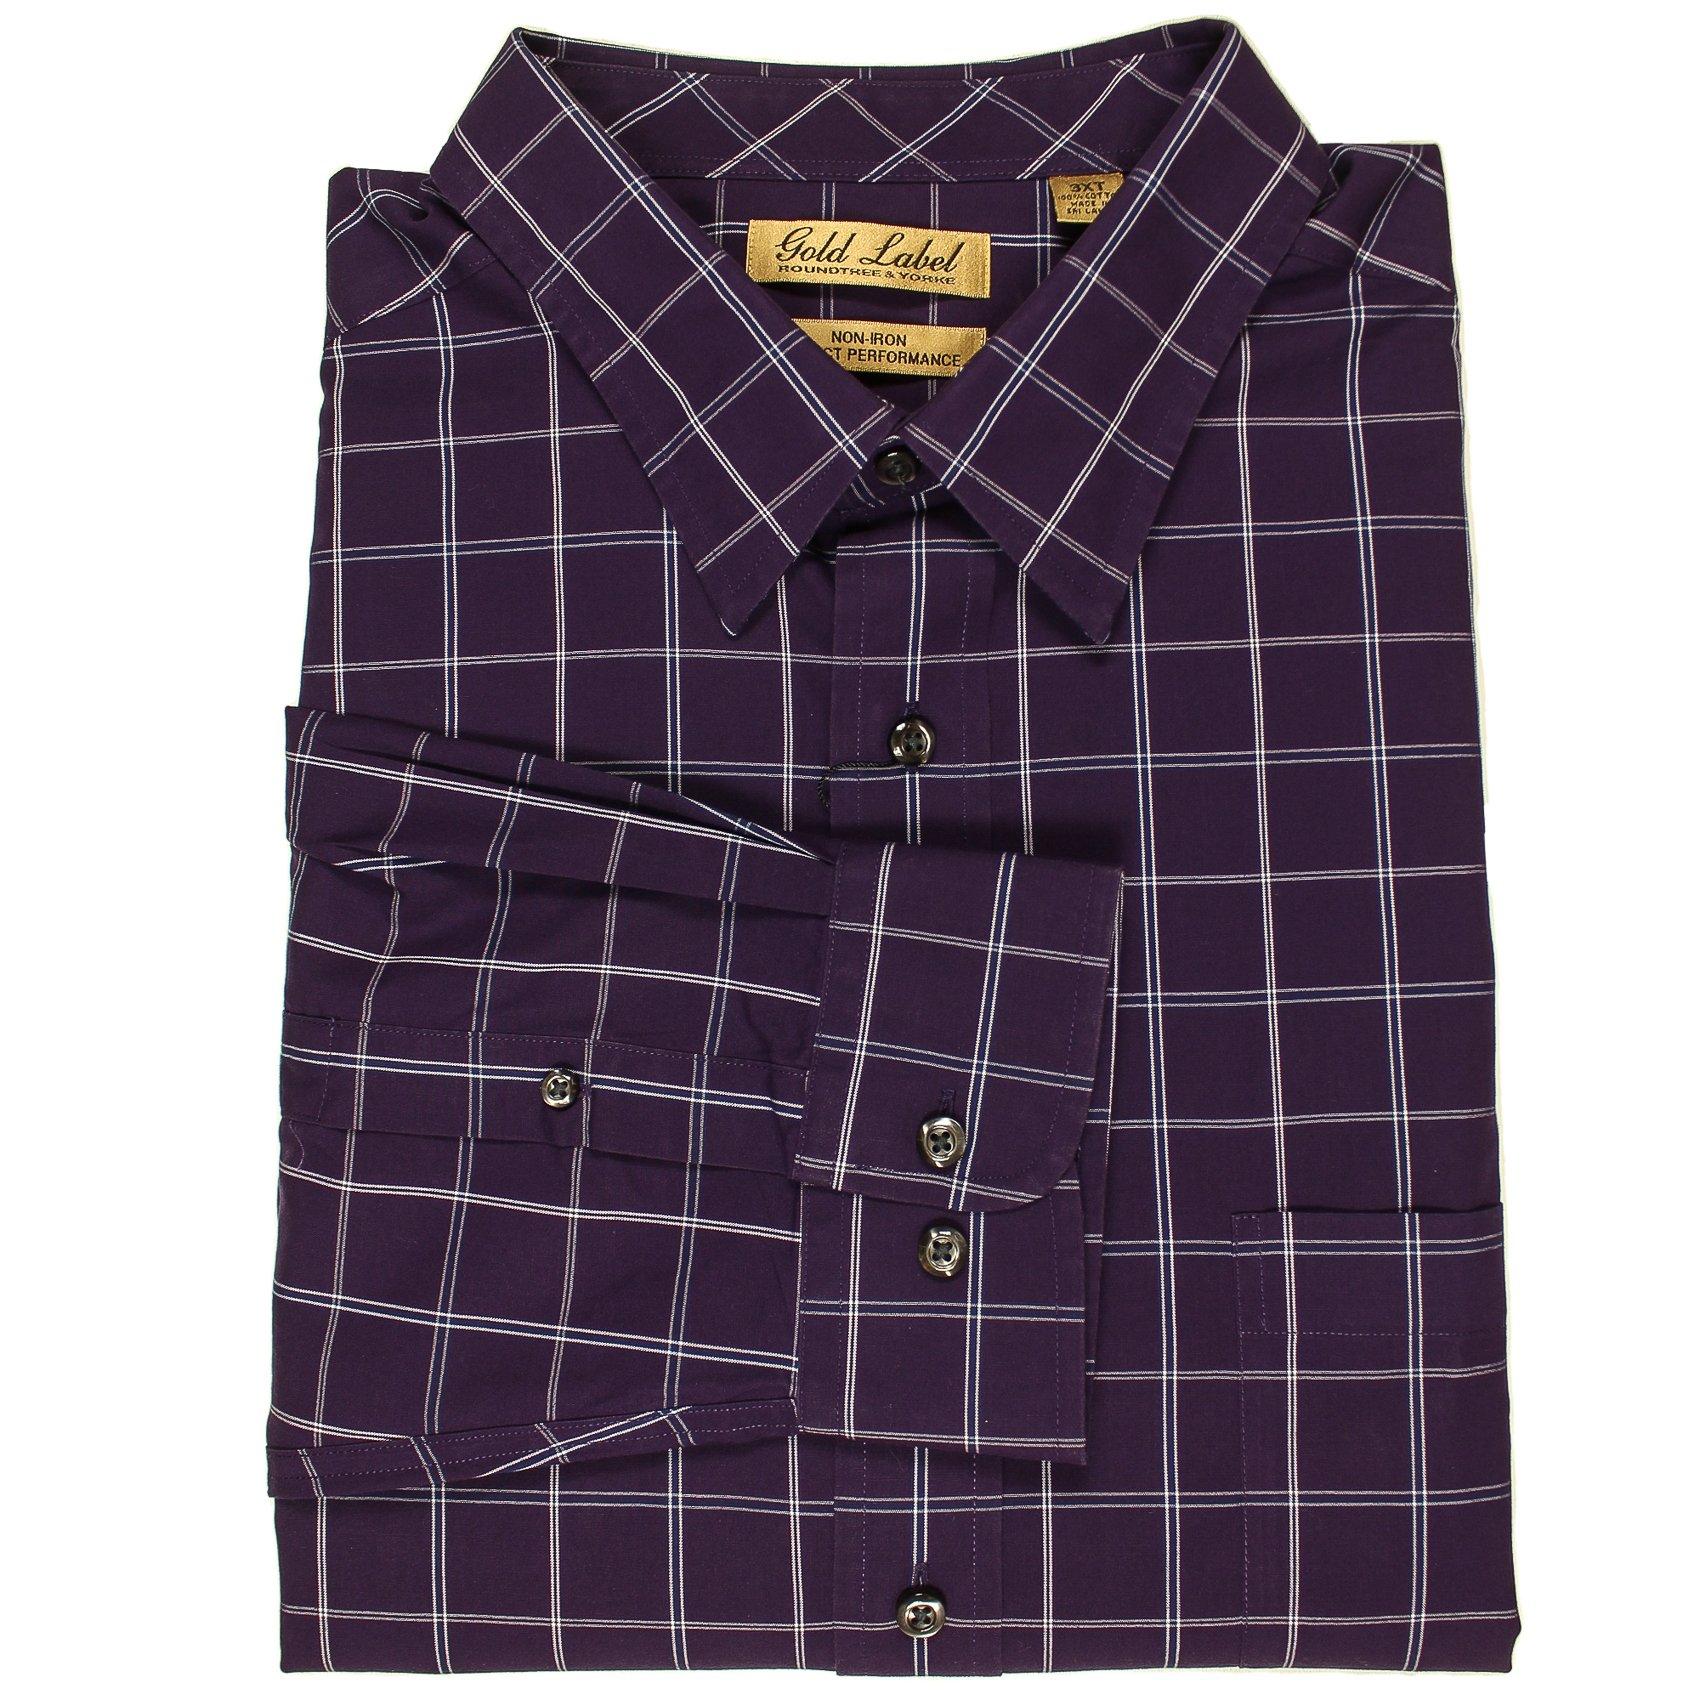 Roundtree & Yorke Gold Label Non-Iron Wrinkle Free Perfect Performance Men's Big & Tall Long Sleeve Shirt (Plum Windowpane/XLT)